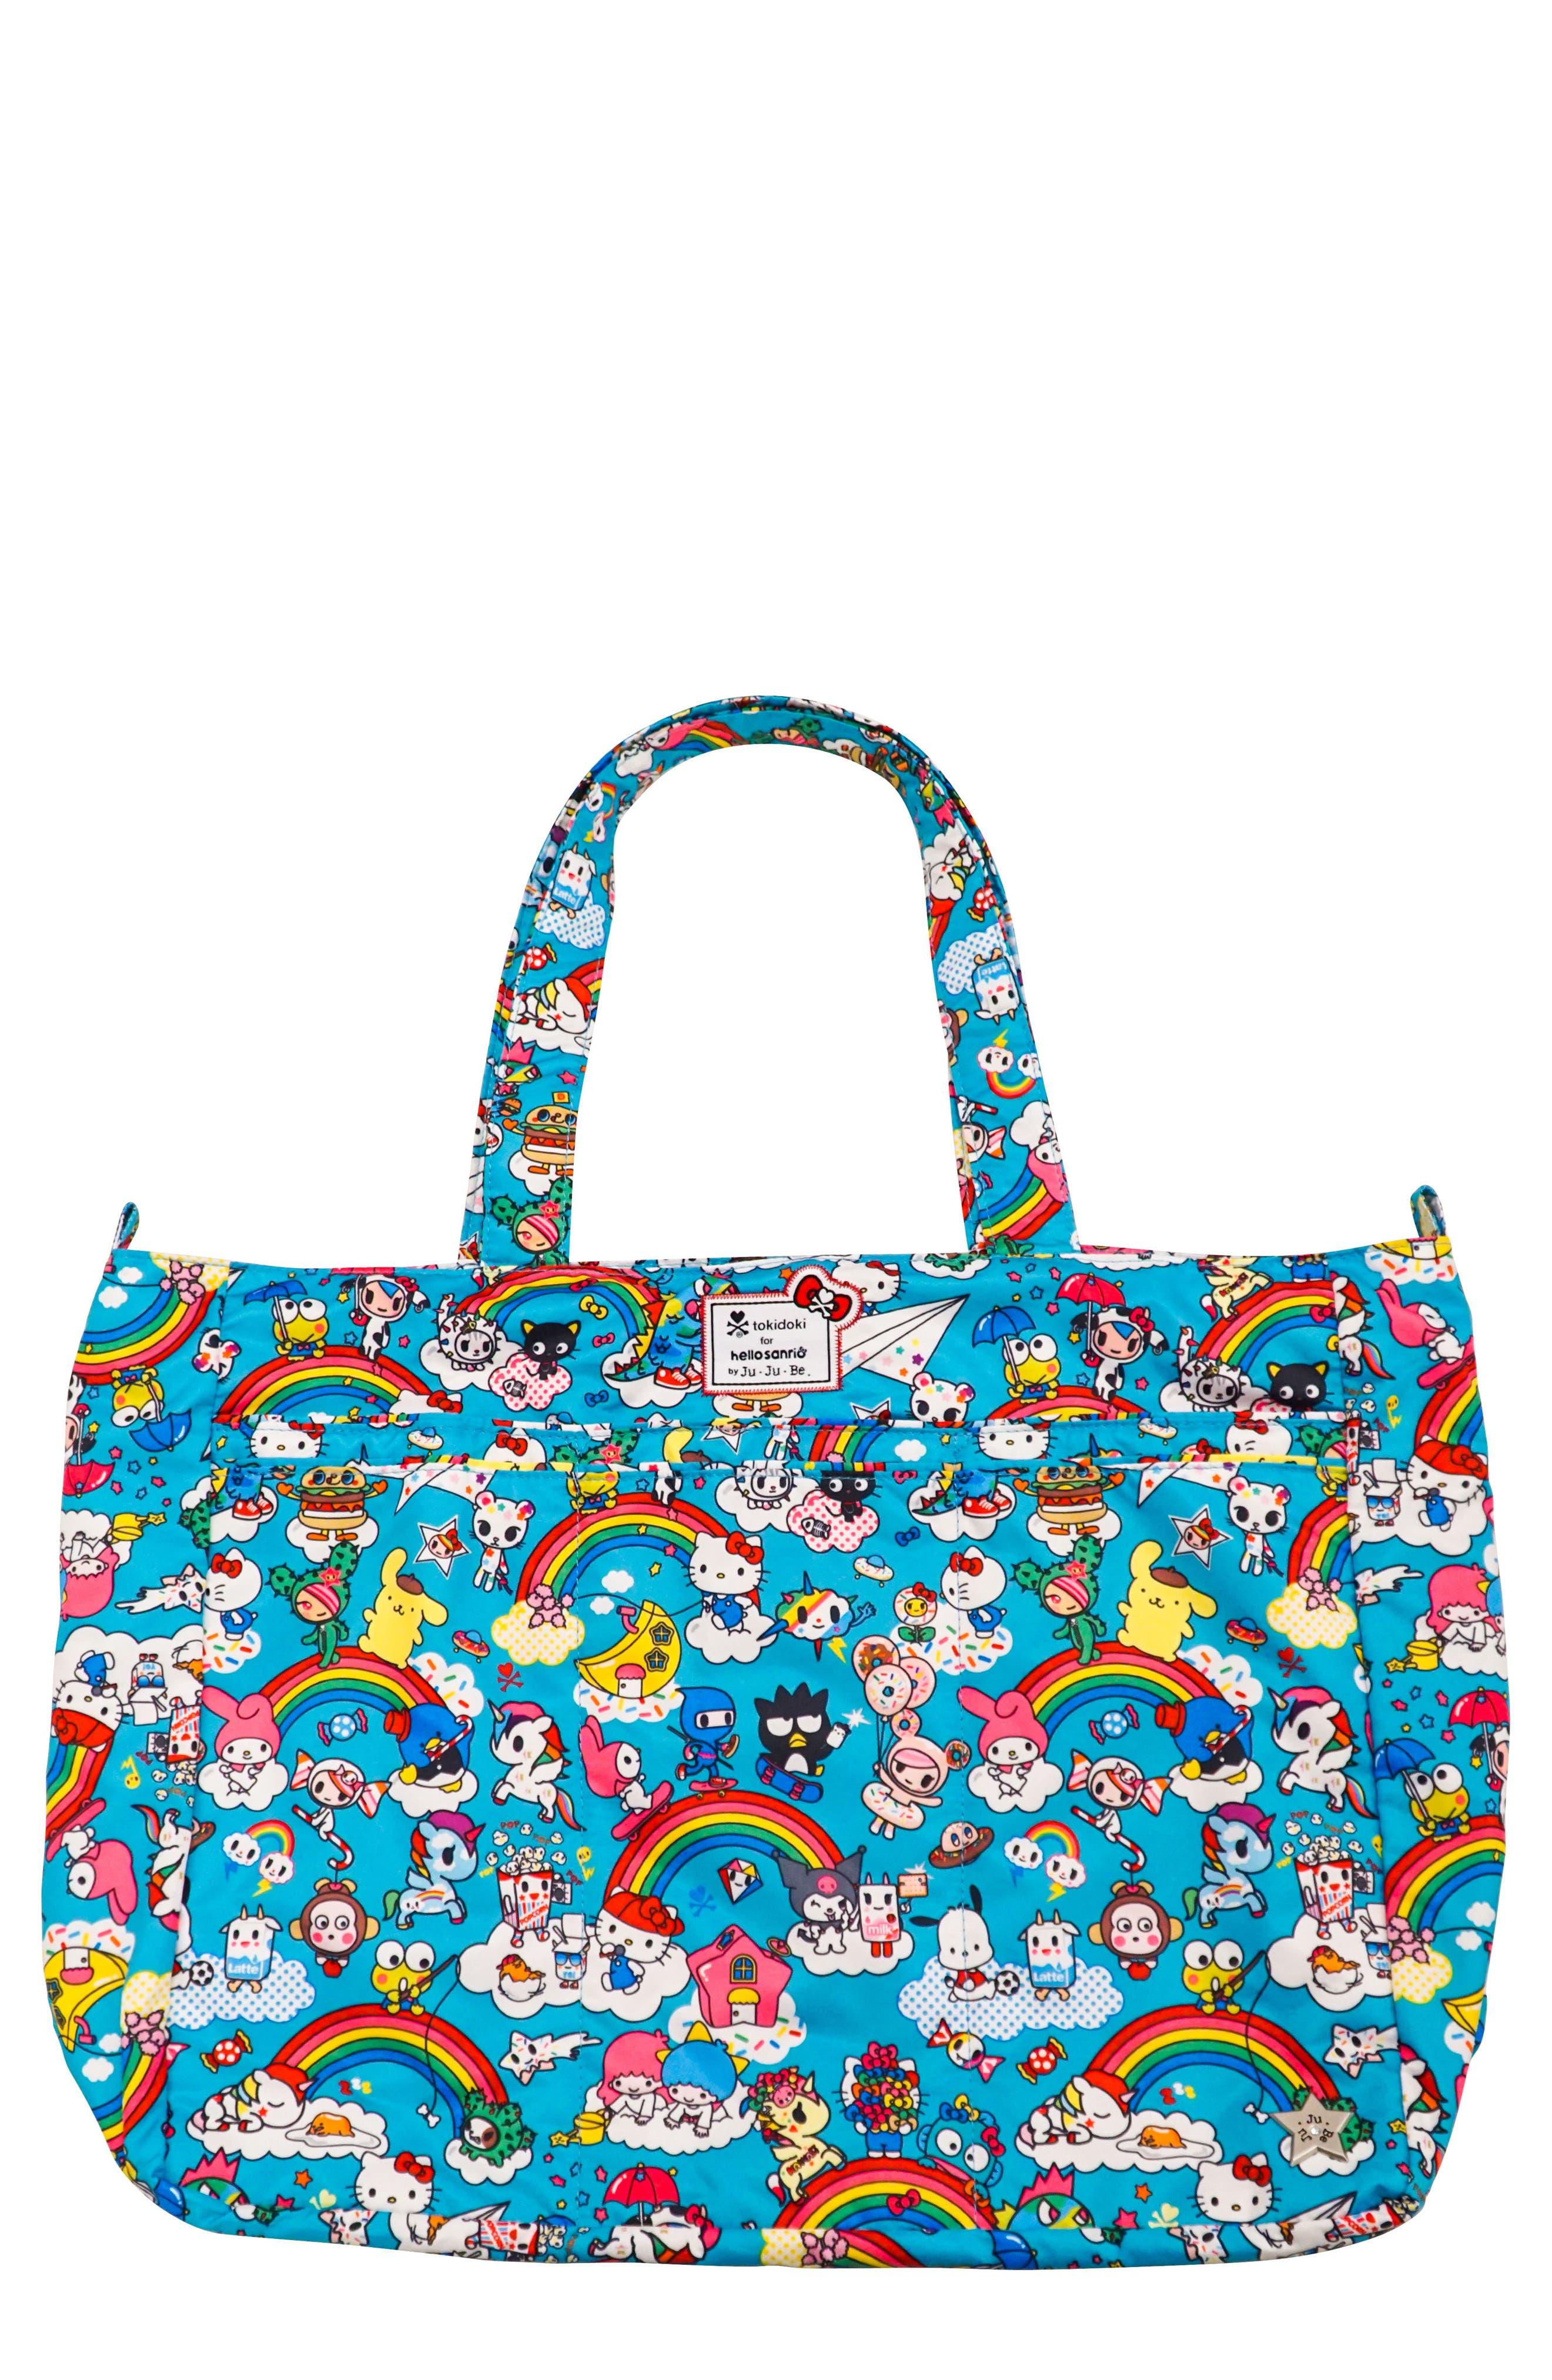 x tokidoki for Hello Sanrio Rainbow Dreams Be Super Diaper Bag,                             Main thumbnail 1, color,                             433